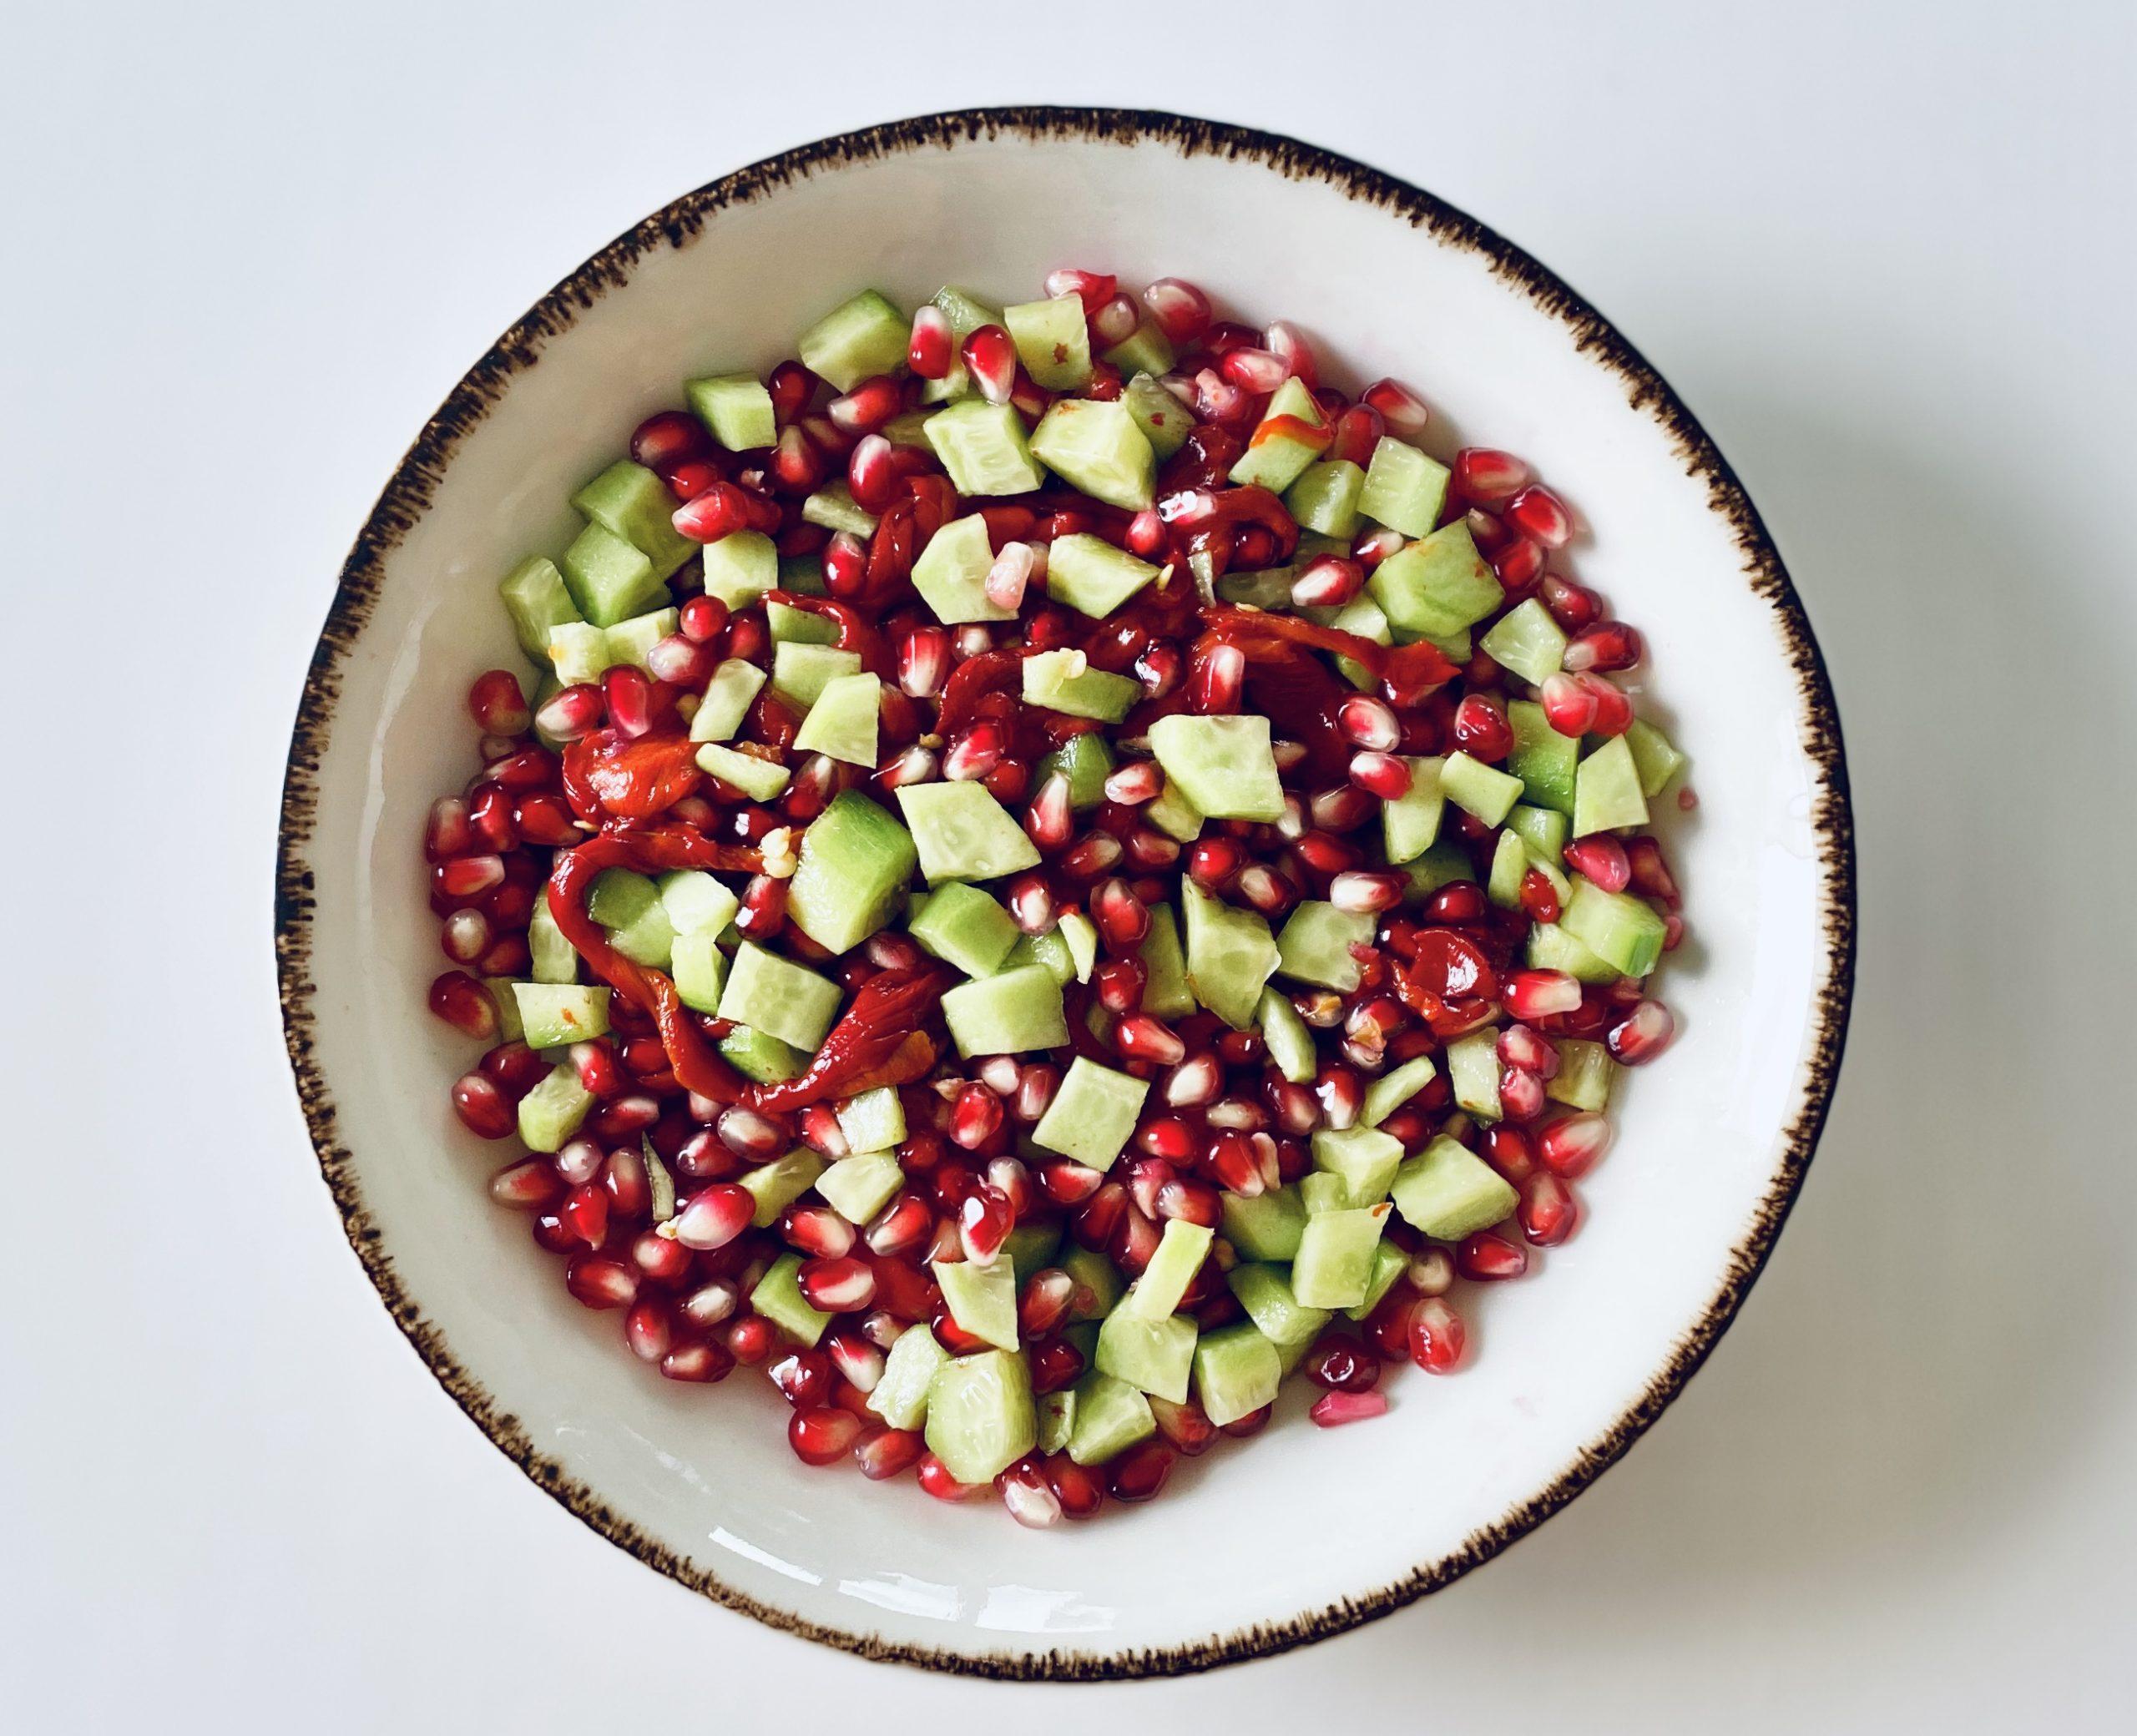 Köz Biberli & Narlı Salata